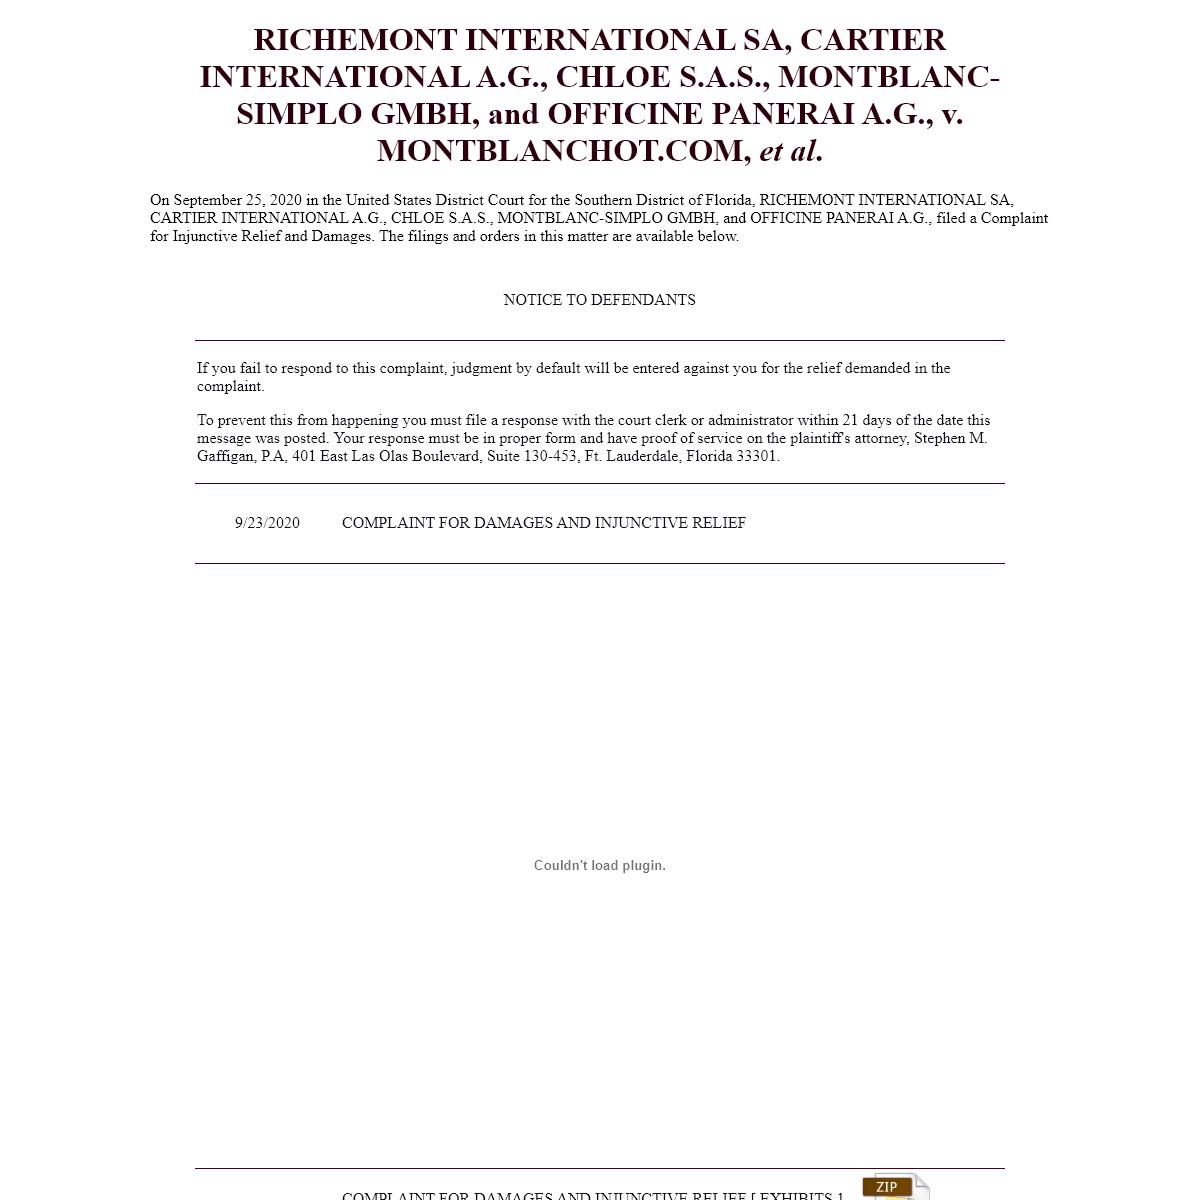 RICHEMONT INTERNATIONAL SA, CARTIER INTERNATIONAL A.G., CHLOE S.A.S., MONTBLANC-SIMPLO GMBH, and OFFICINE PANERAI A.G. et al., v